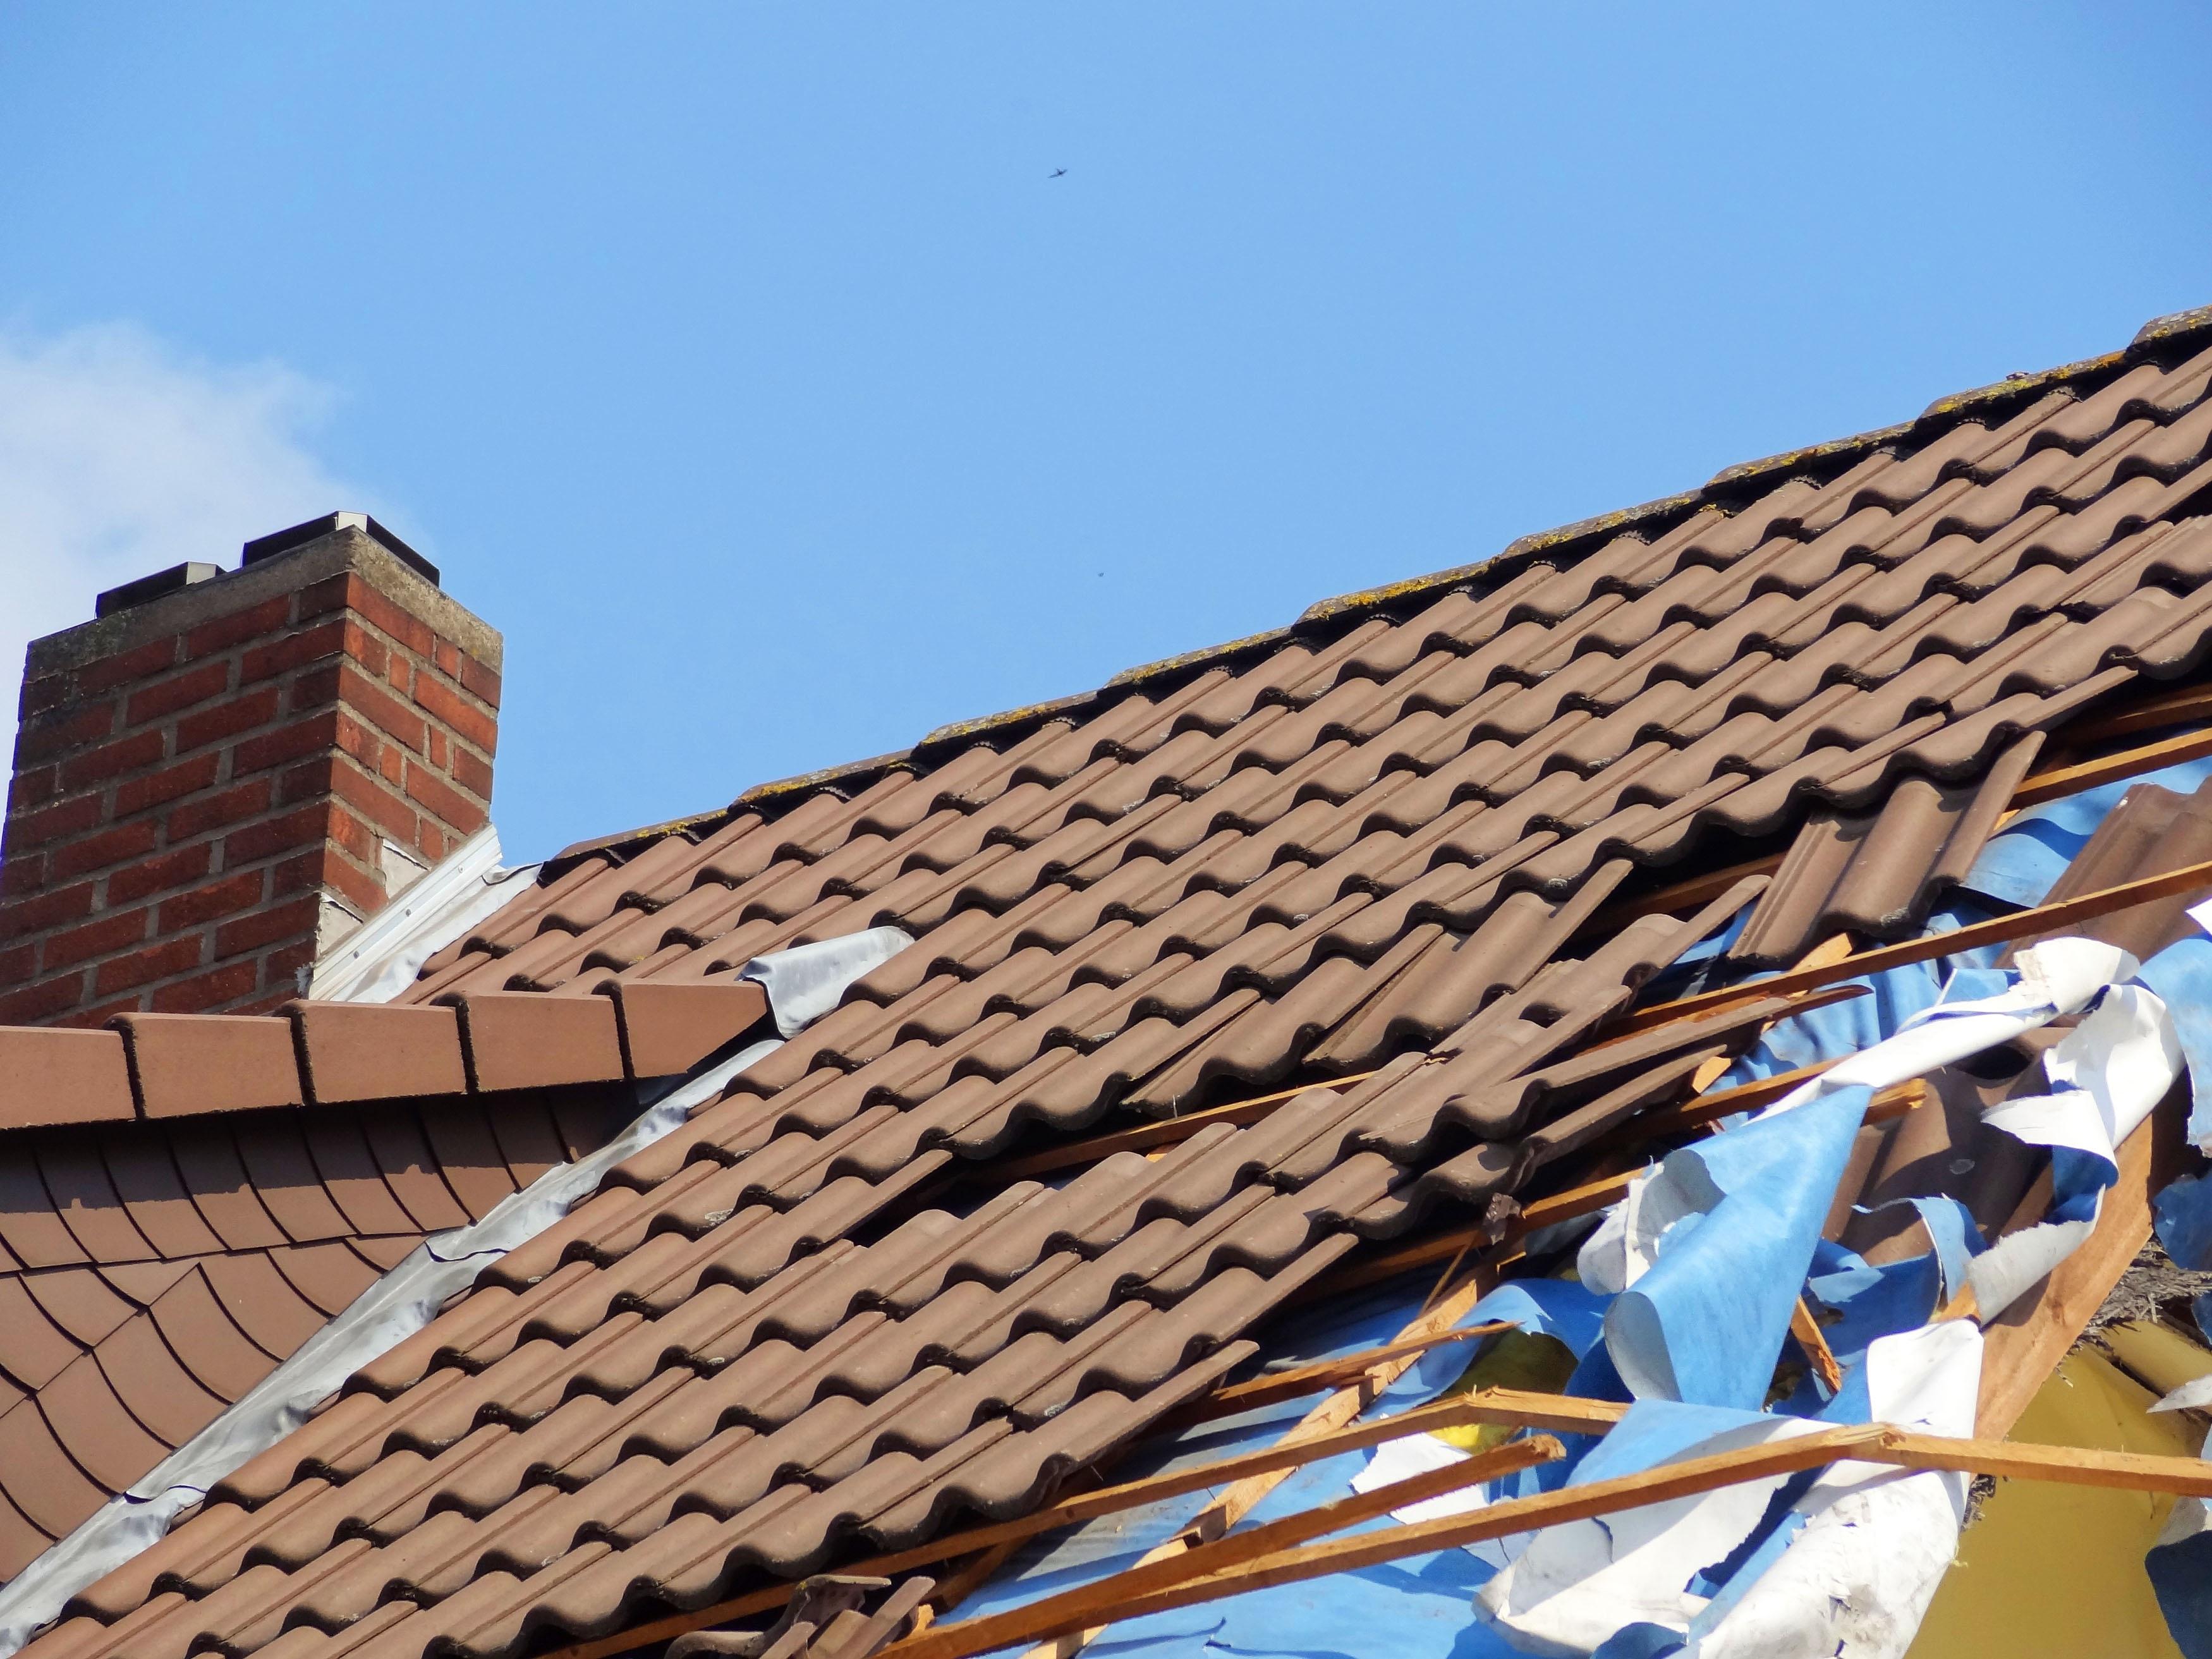 Free Images : roof, tile, roofer, thunderstorm, forward, flash of ...